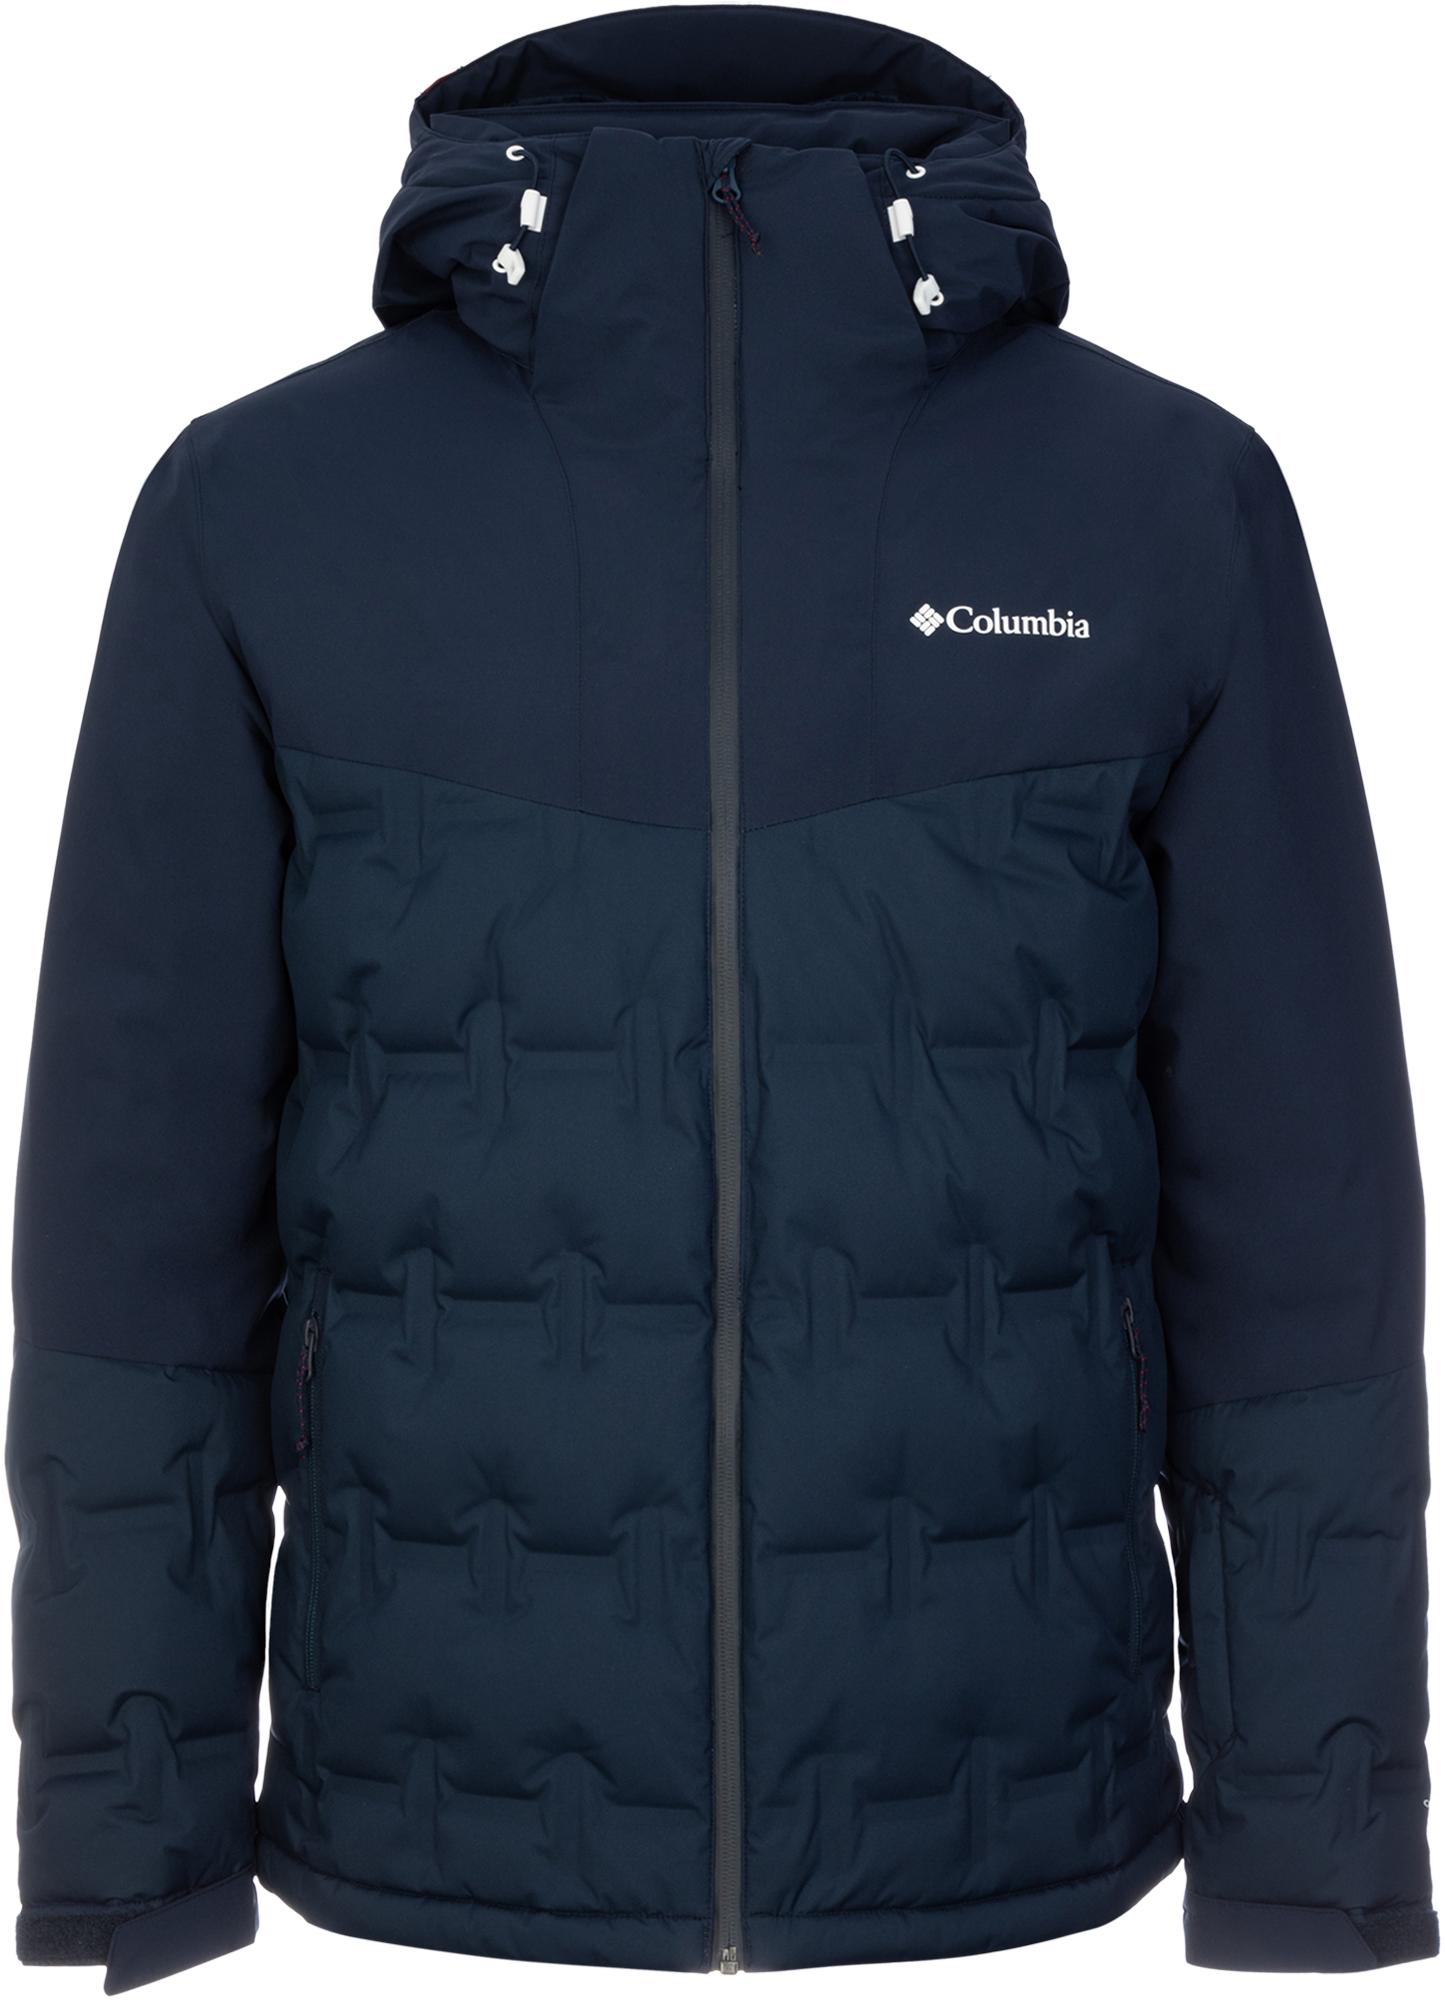 цена на Columbia Куртка пуховая мужская Columbia Wild Card, размер 52-54